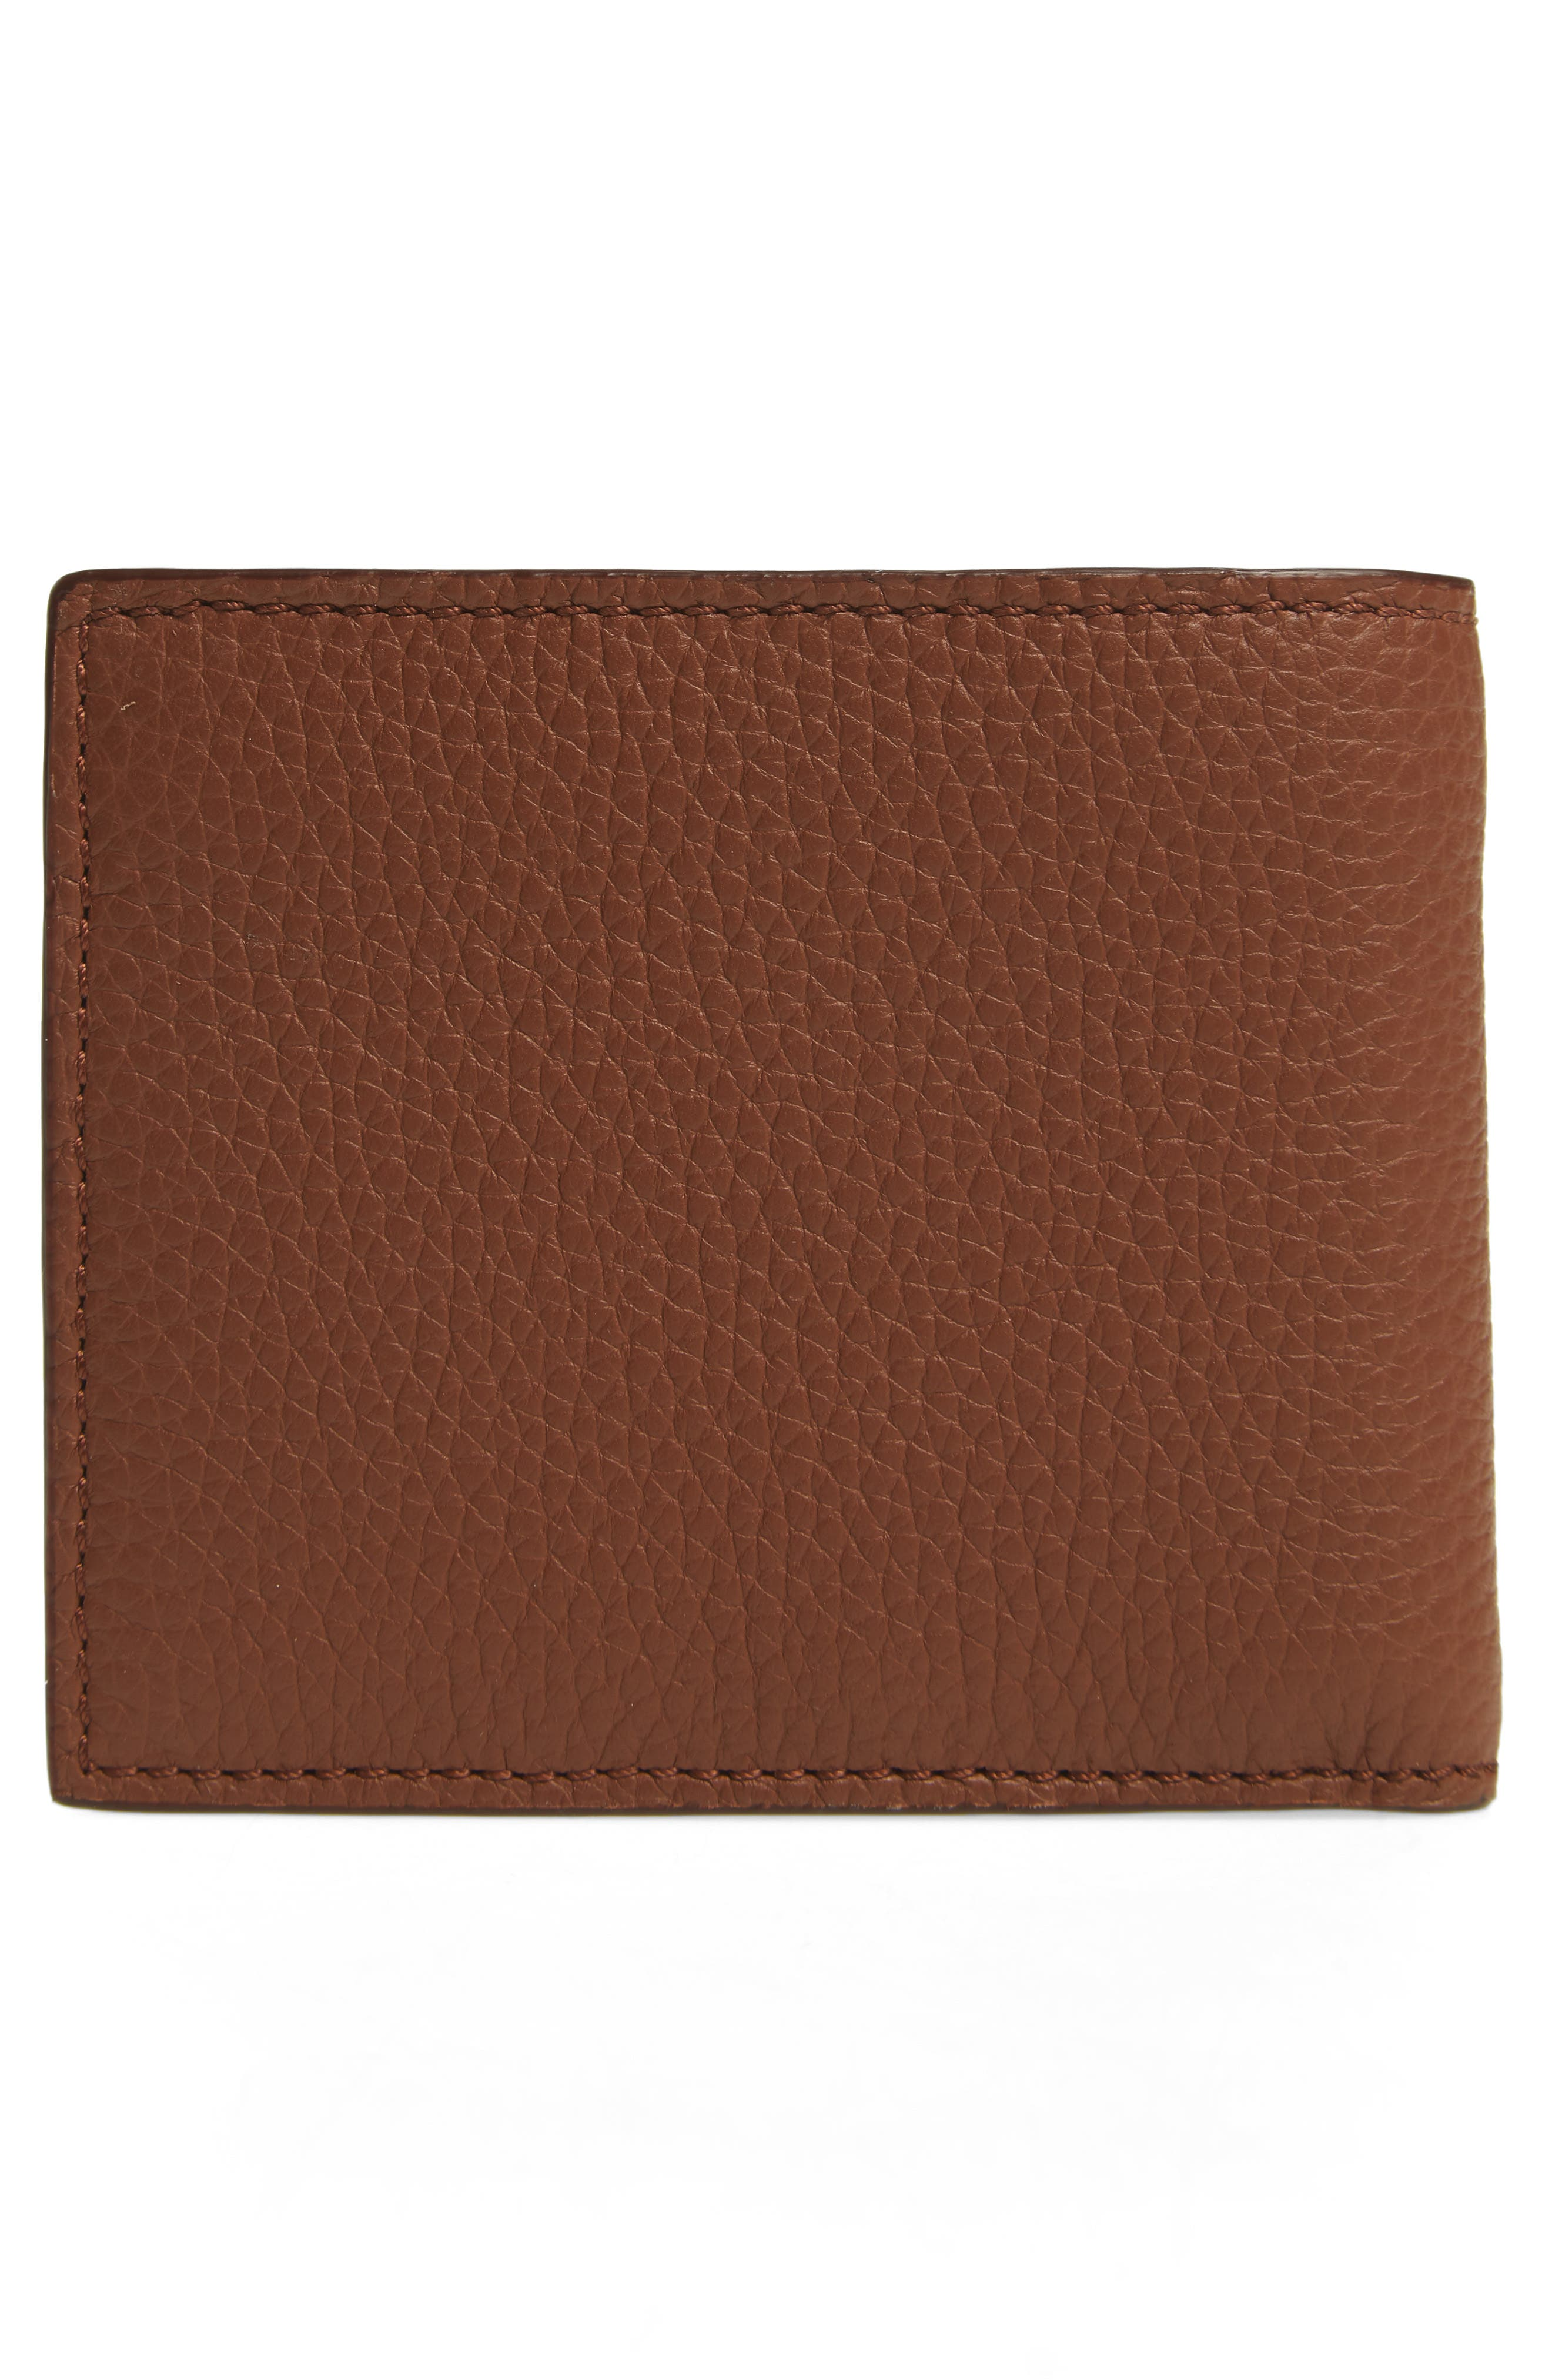 Alternate Image 3  - Burberry Billfold Wallet